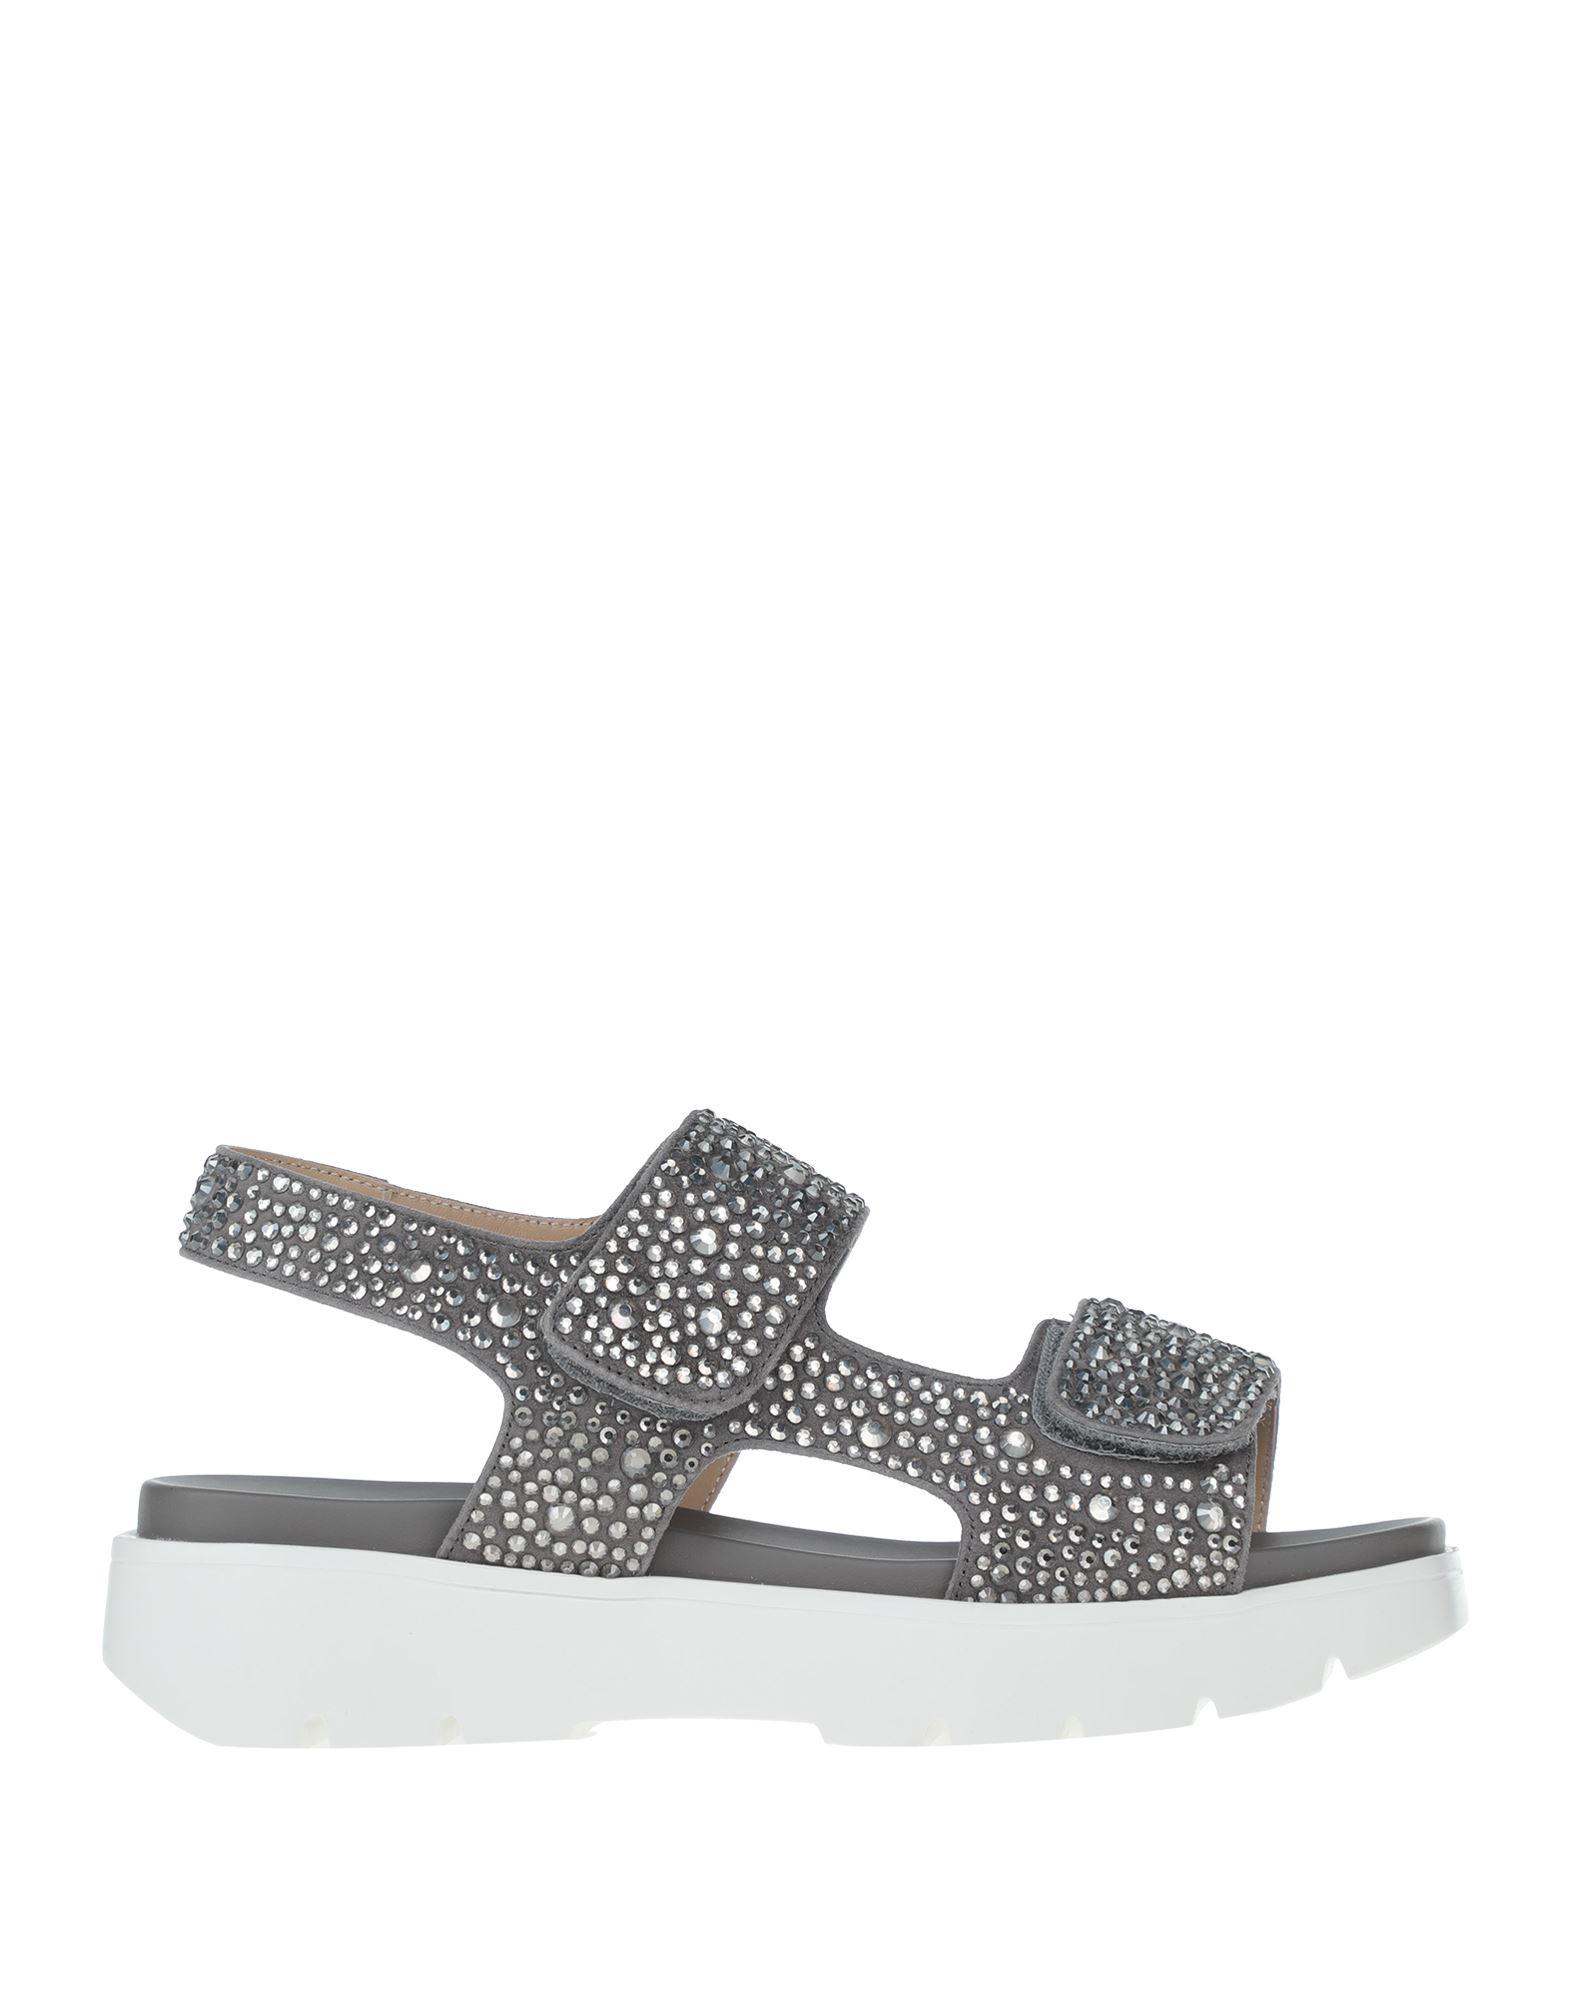 Gianmarco Lorenzi Sandals In Grey